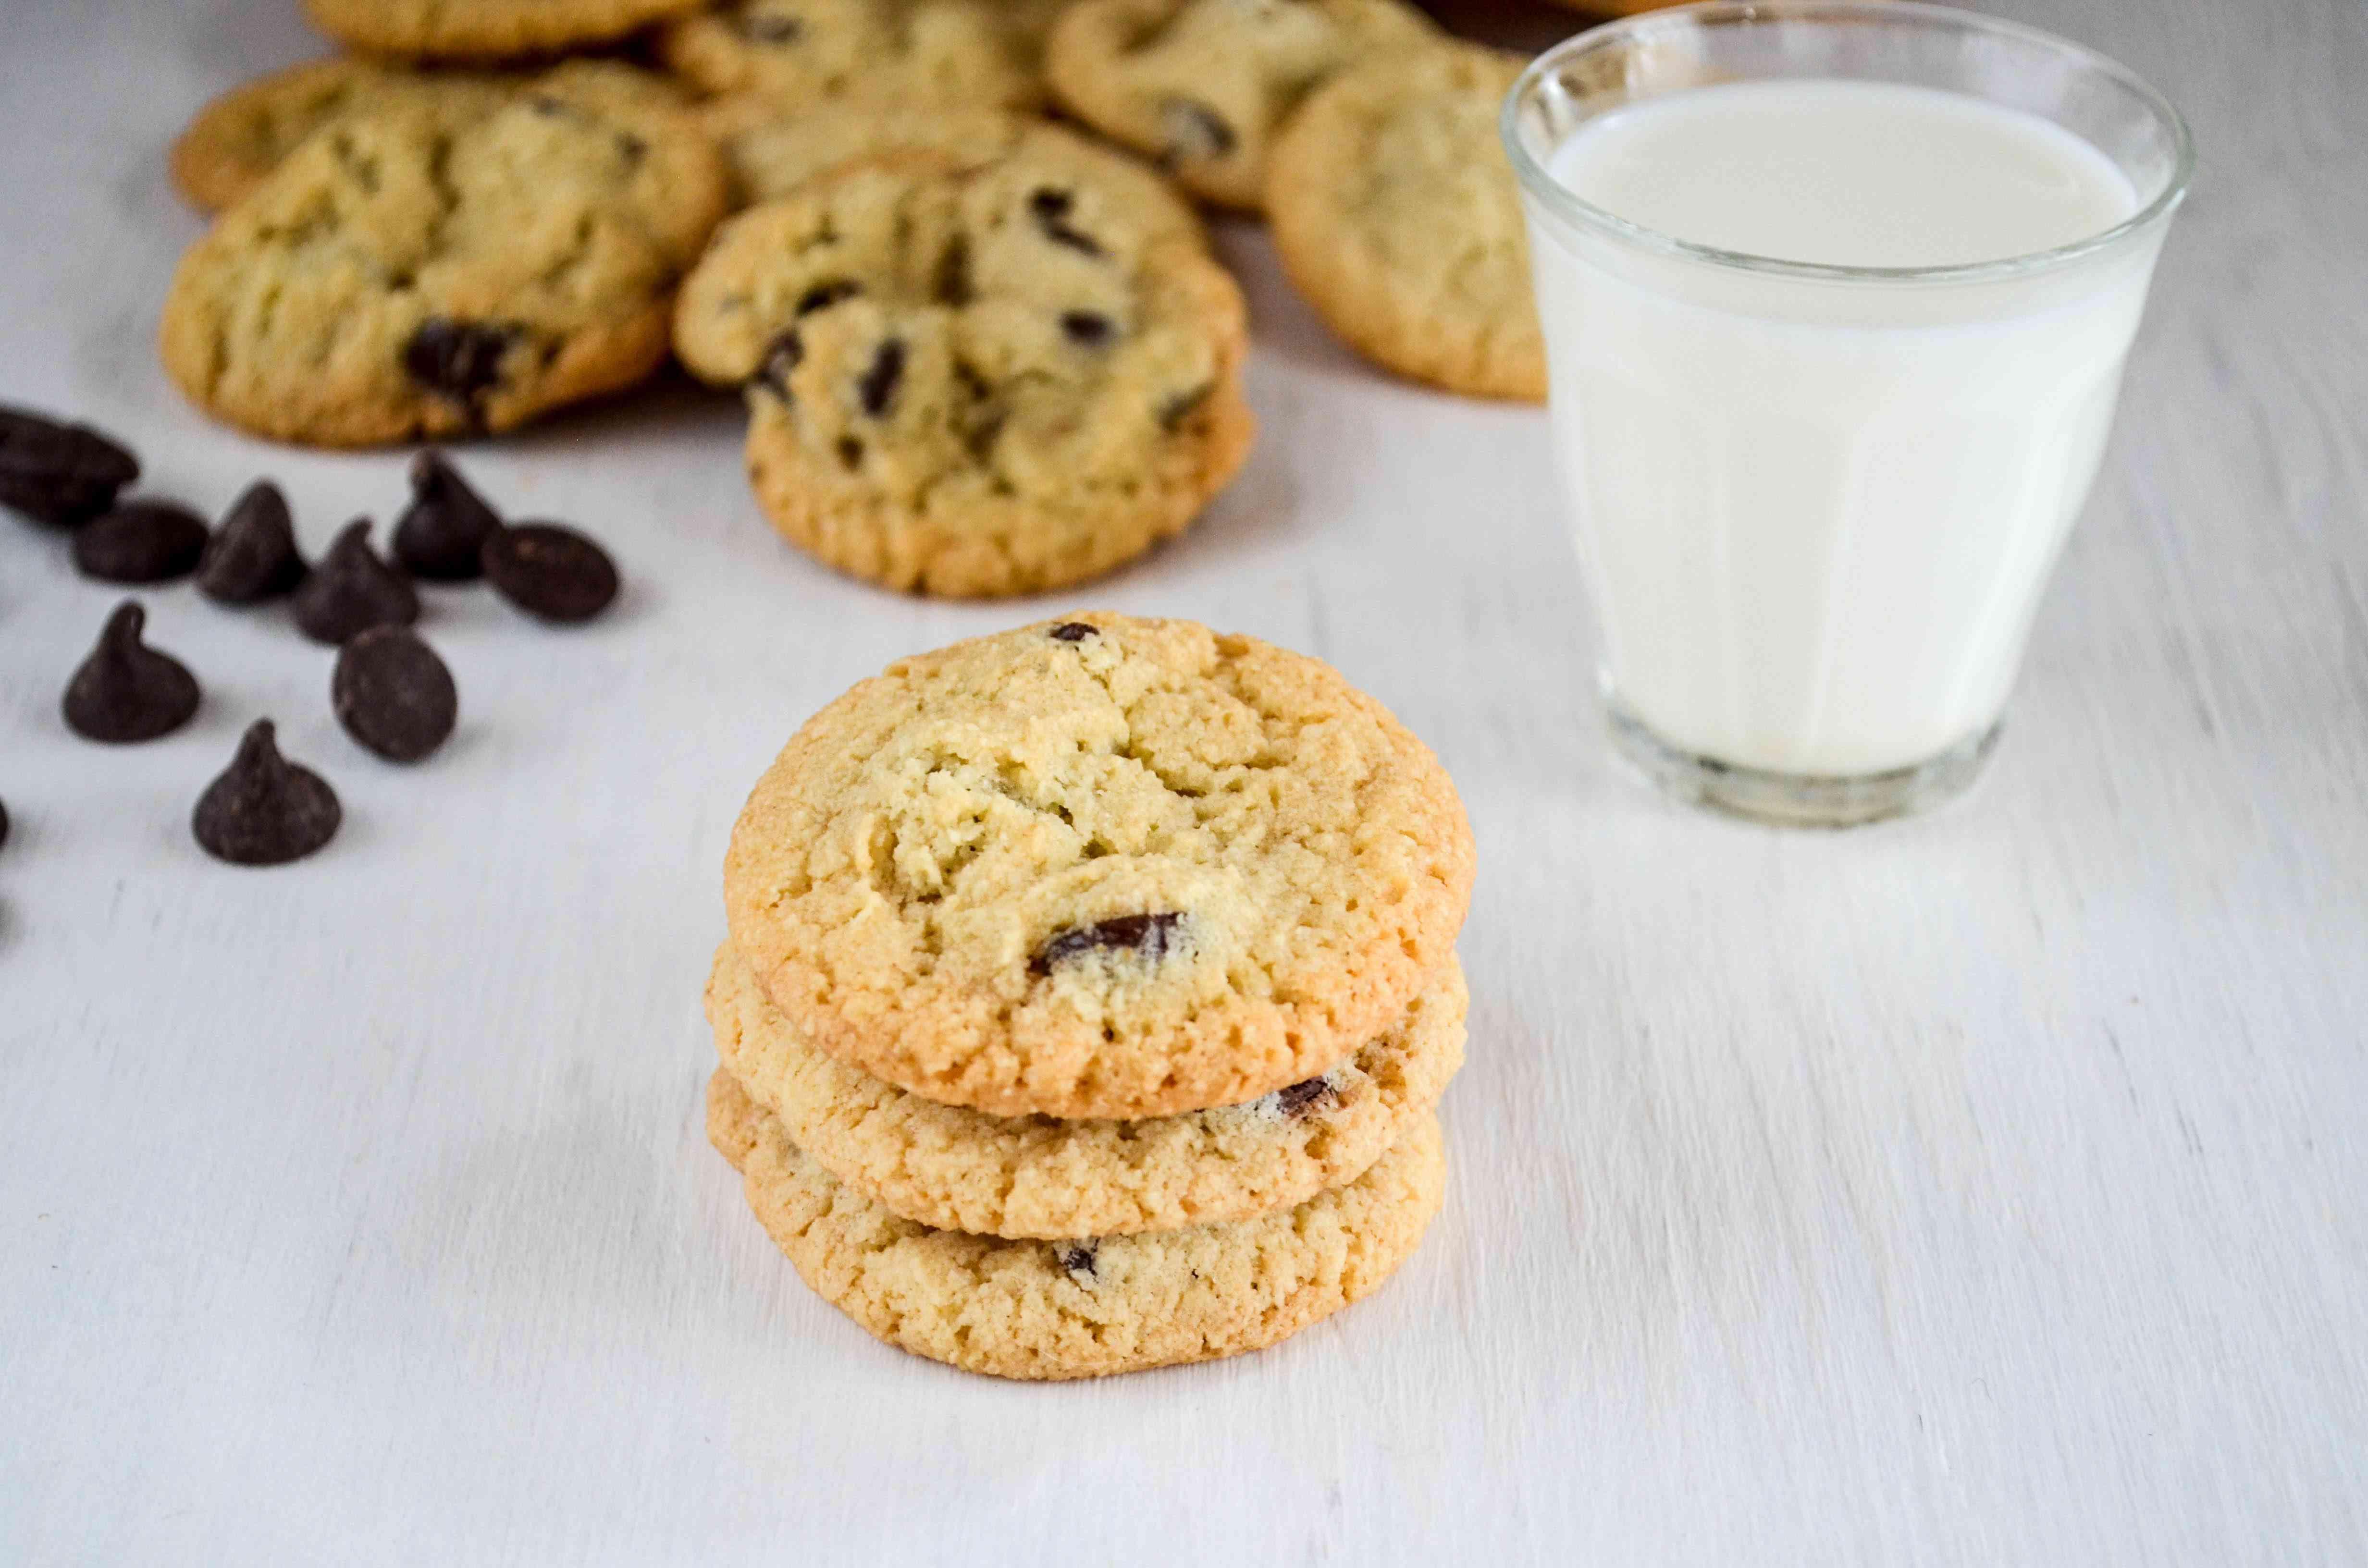 Grain-Free Almond Flour Chocolate Chip Cookies